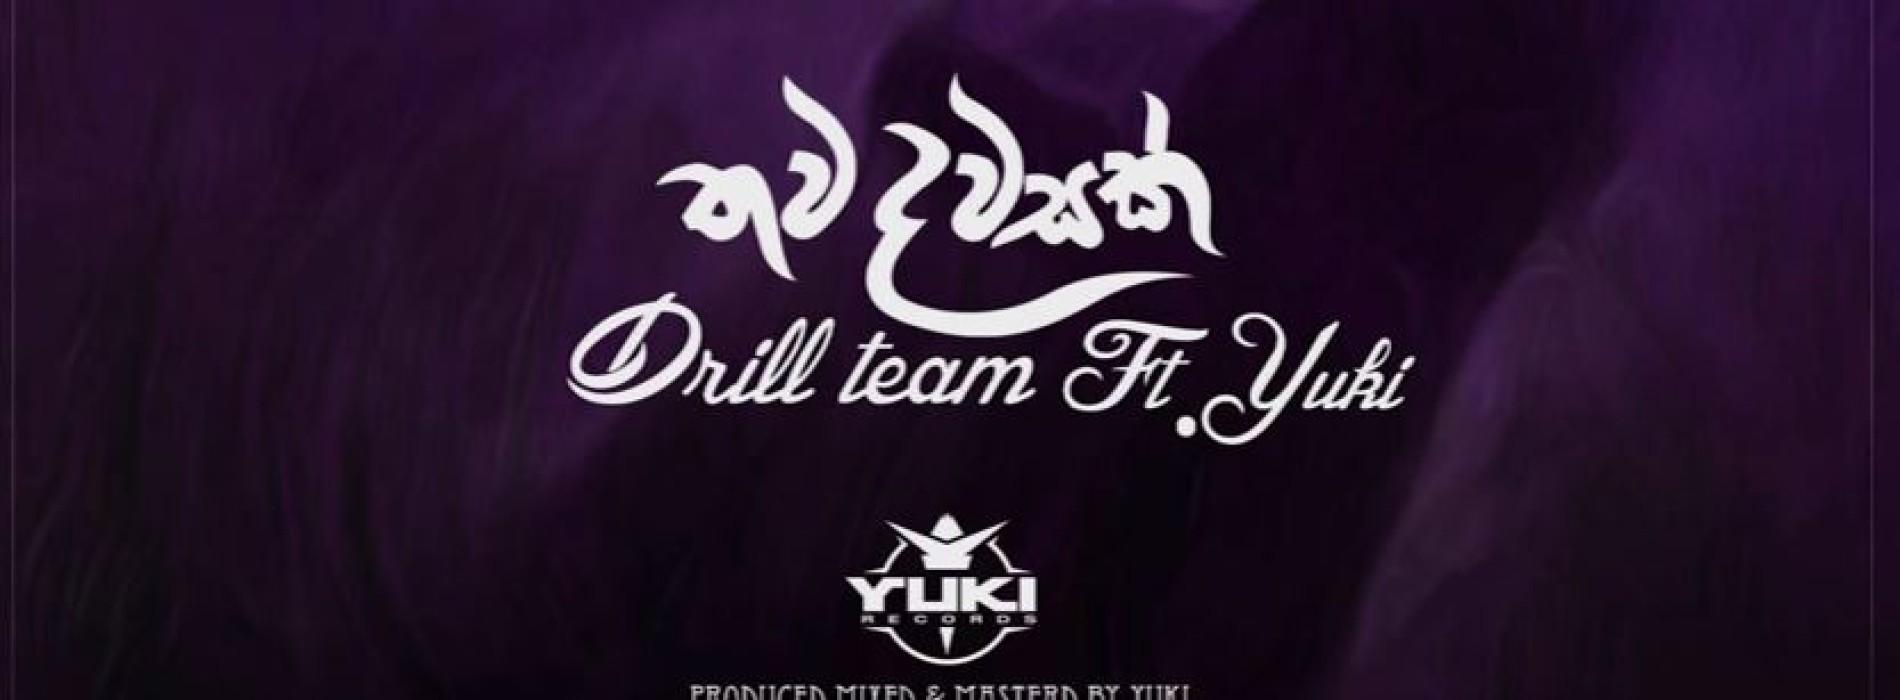 Drill Team ft. Yuki – Thawa Dawasak (තව දවසක් )